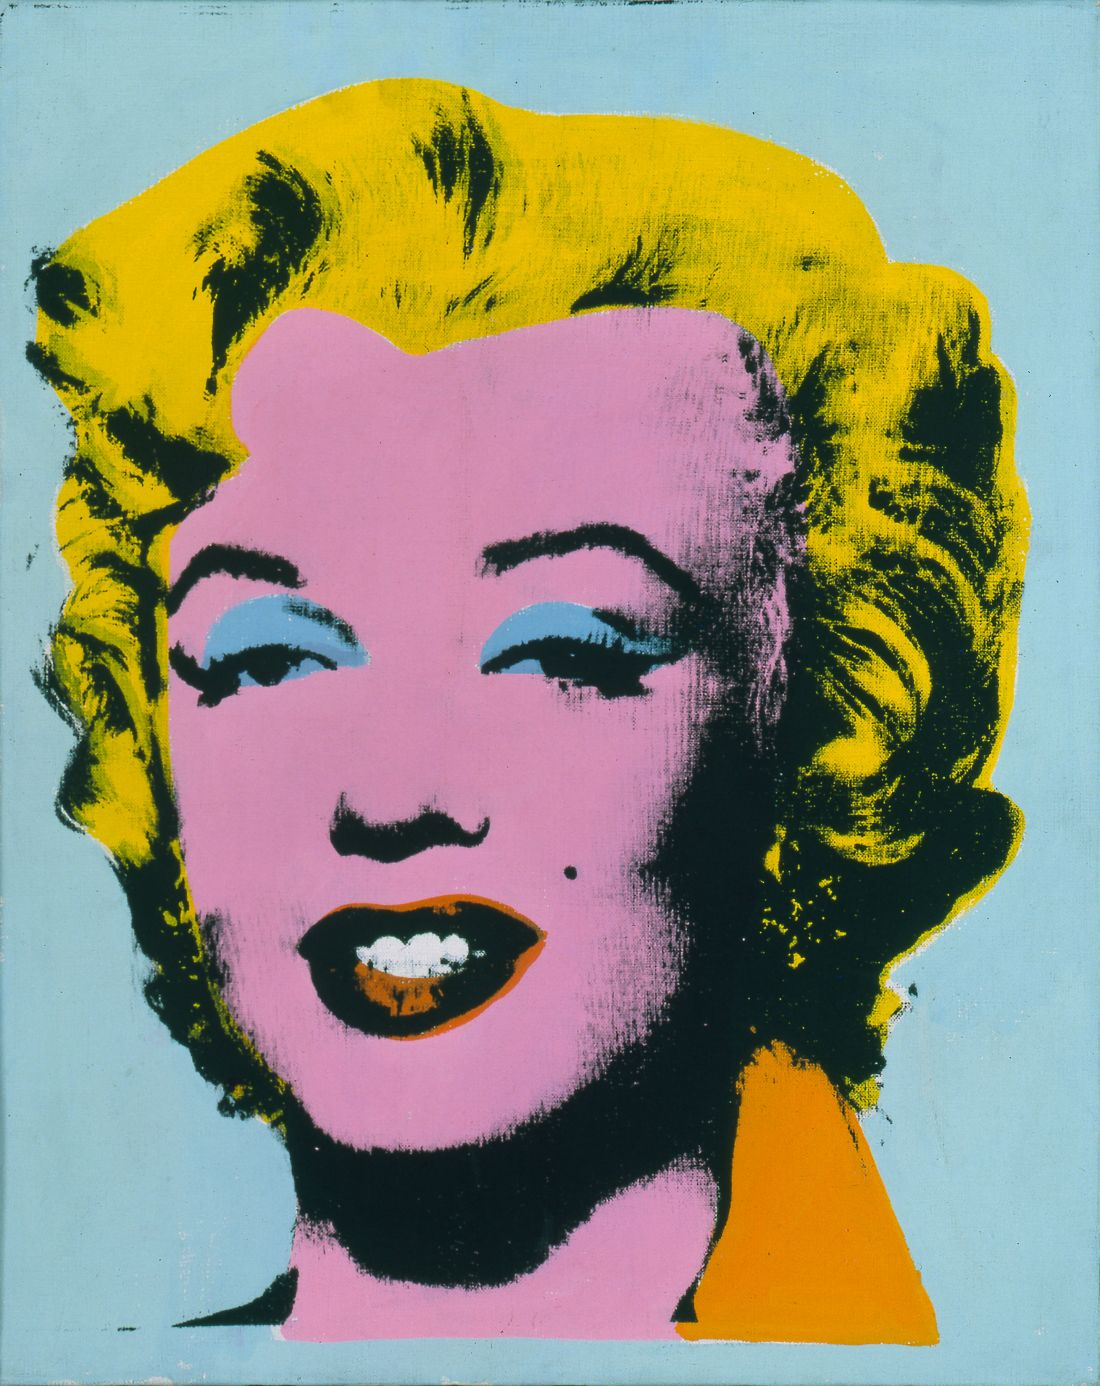 Warhol Women: Andy Warhol's signature silkscreen portraits ...